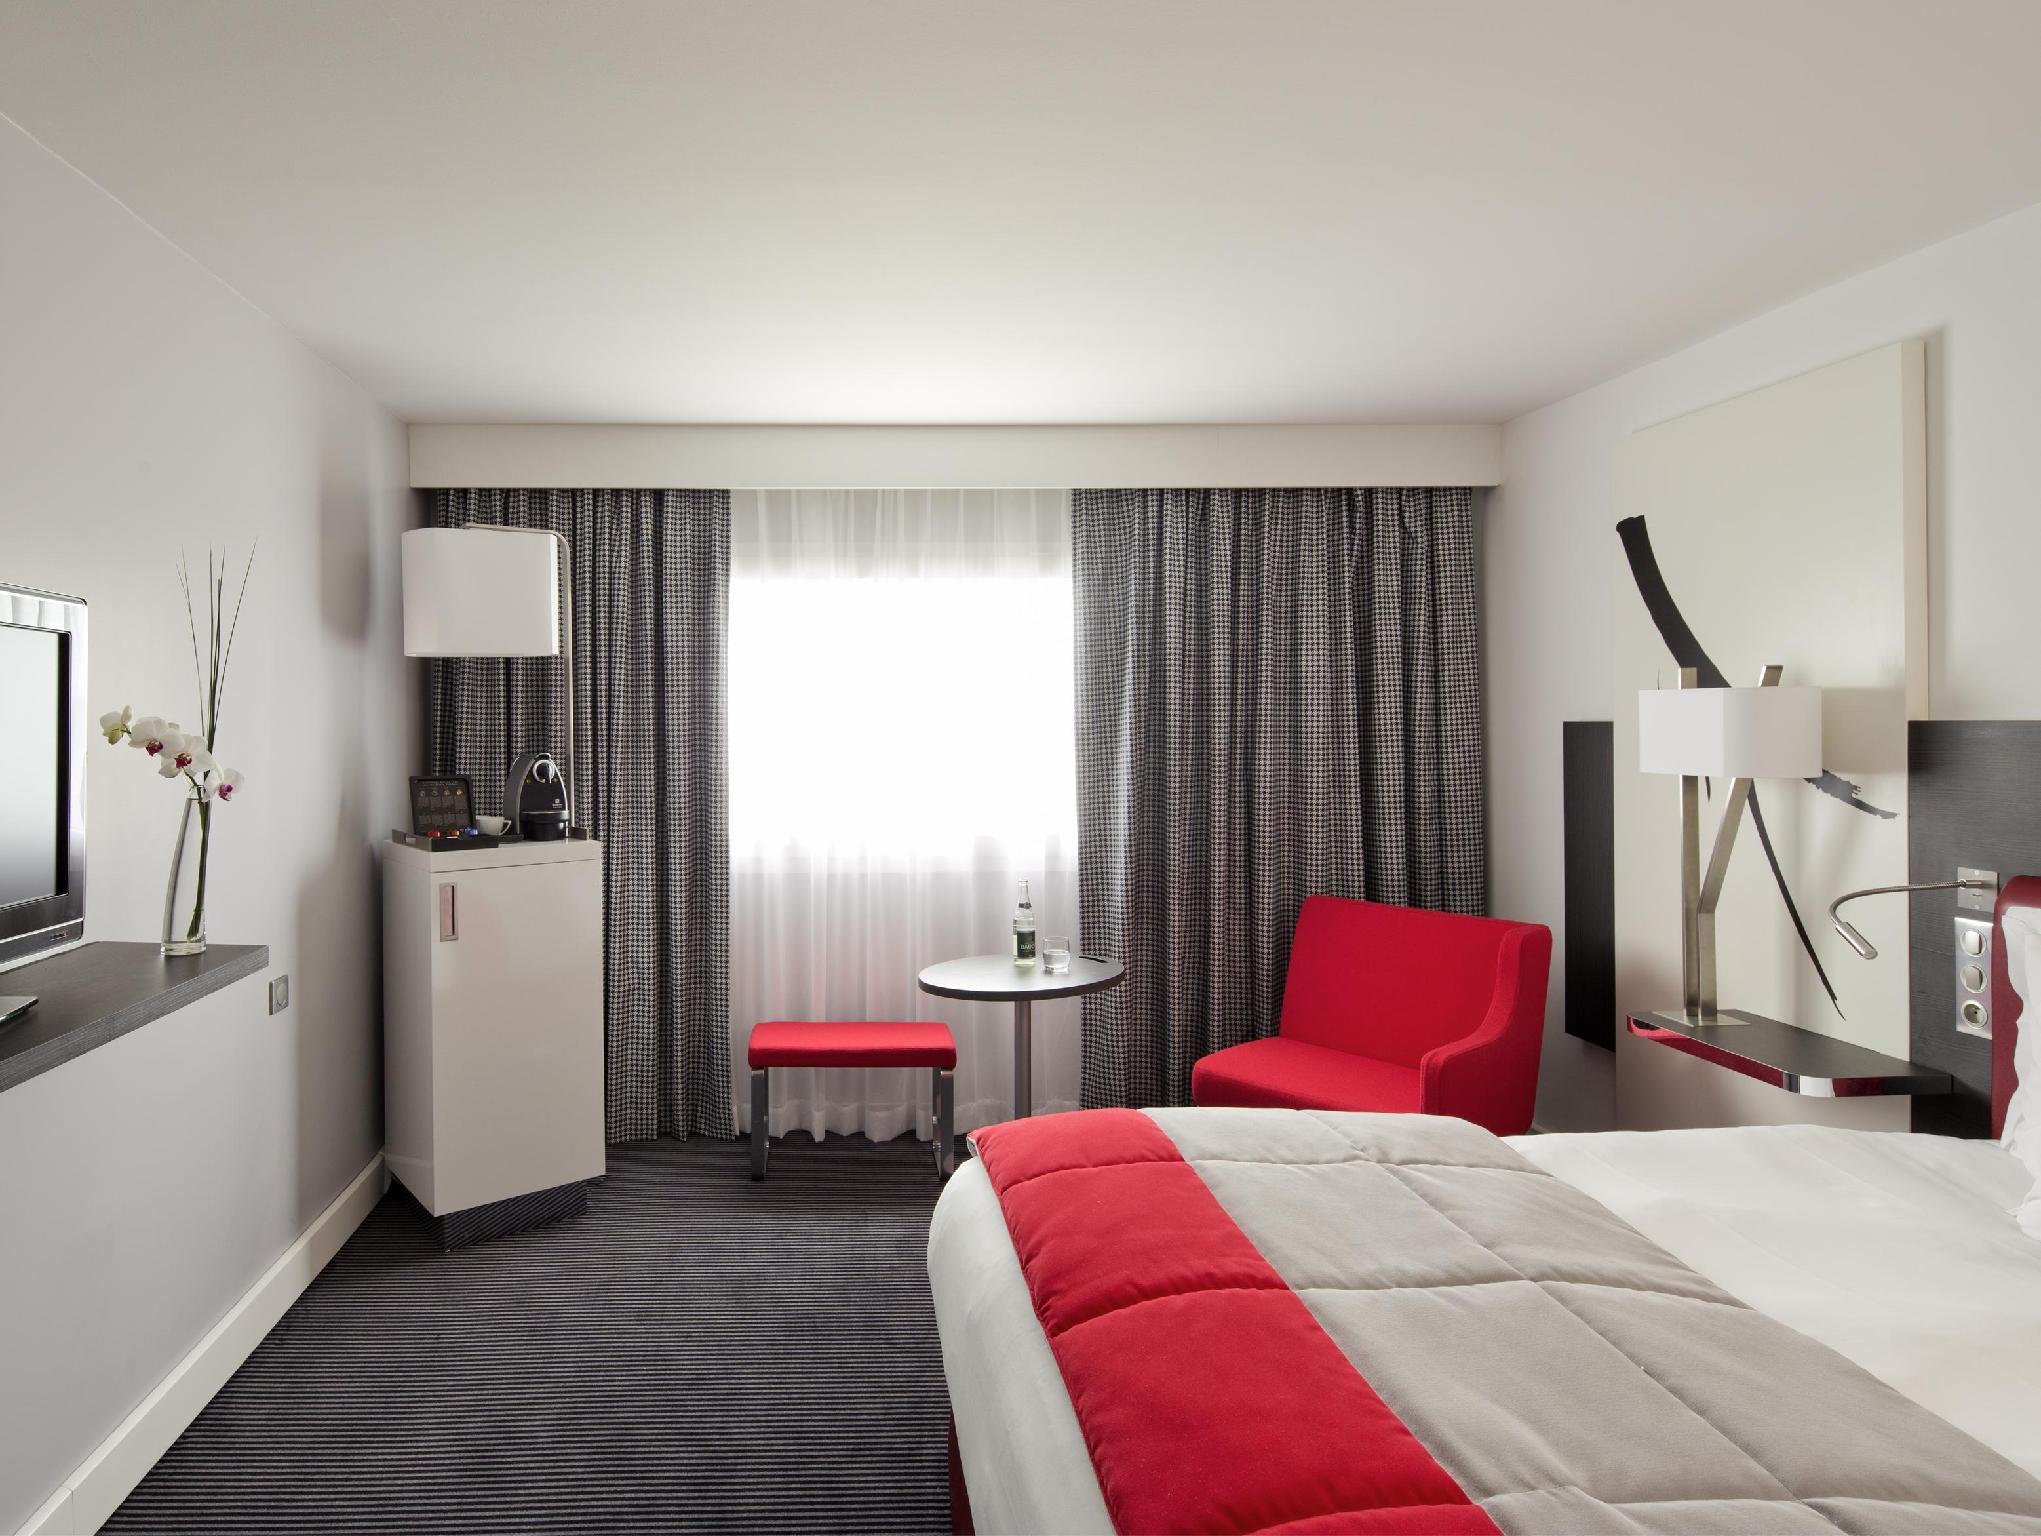 Mercure Paris CDG Airport & Convention Hotel - Hotell och Boende i Frankrike i Europa